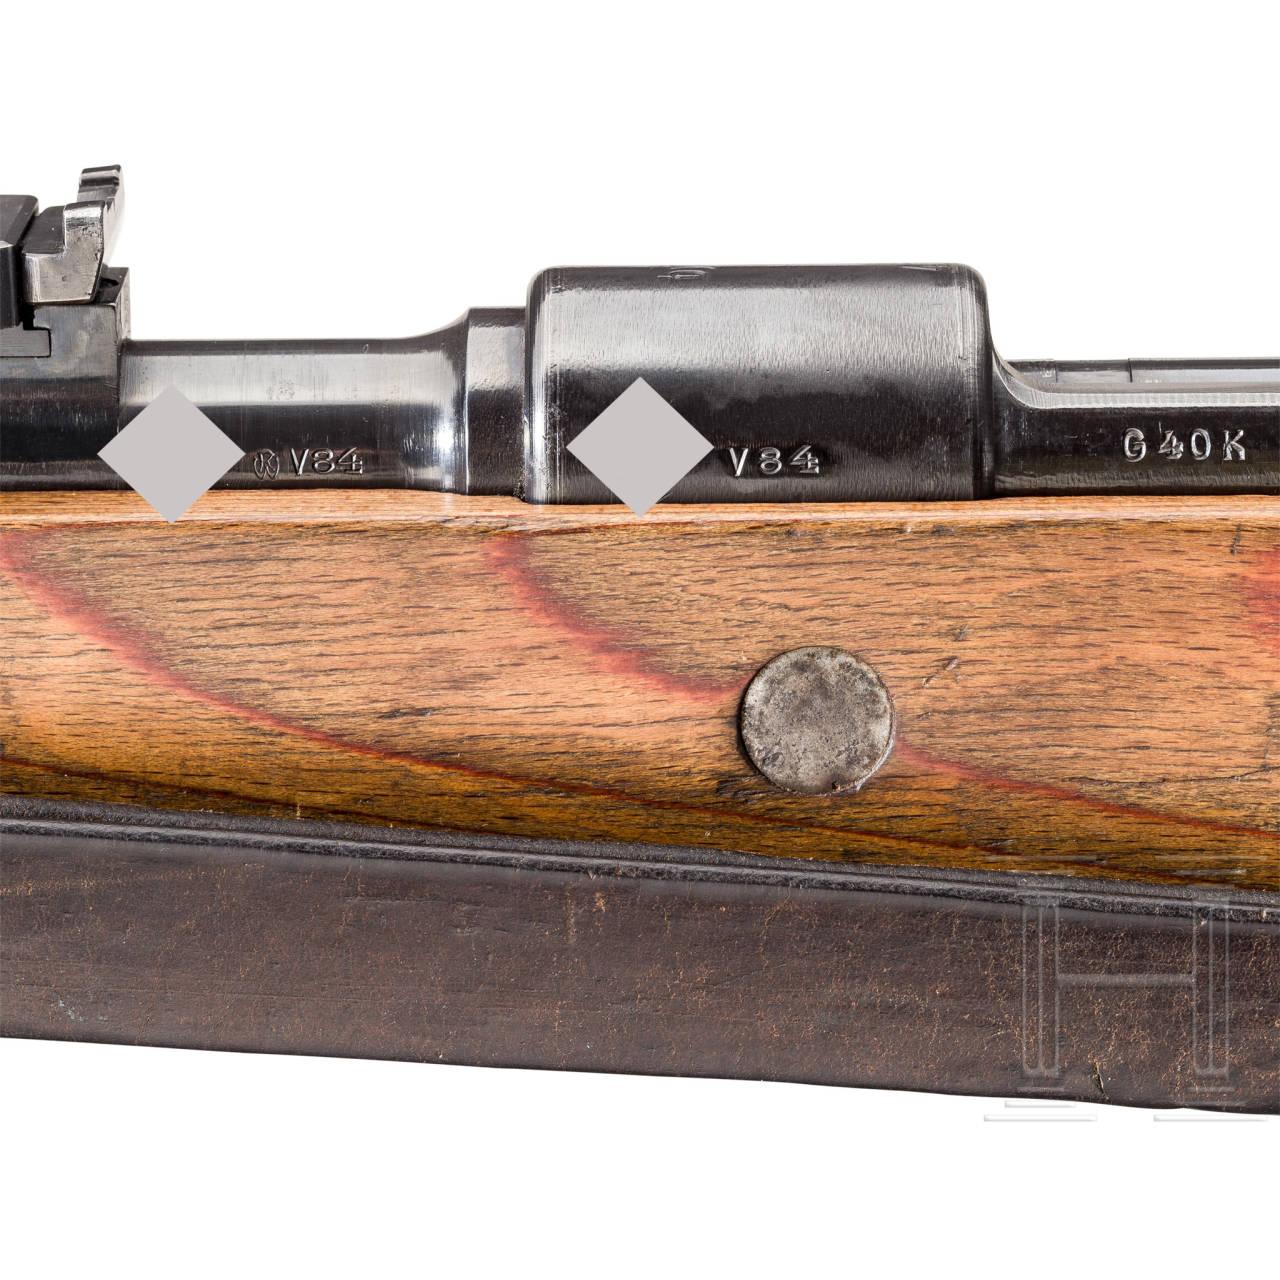 "Karabiner G 40 k, Code ""byf - 41"", gekürzte Experimentalversion des K 98k"